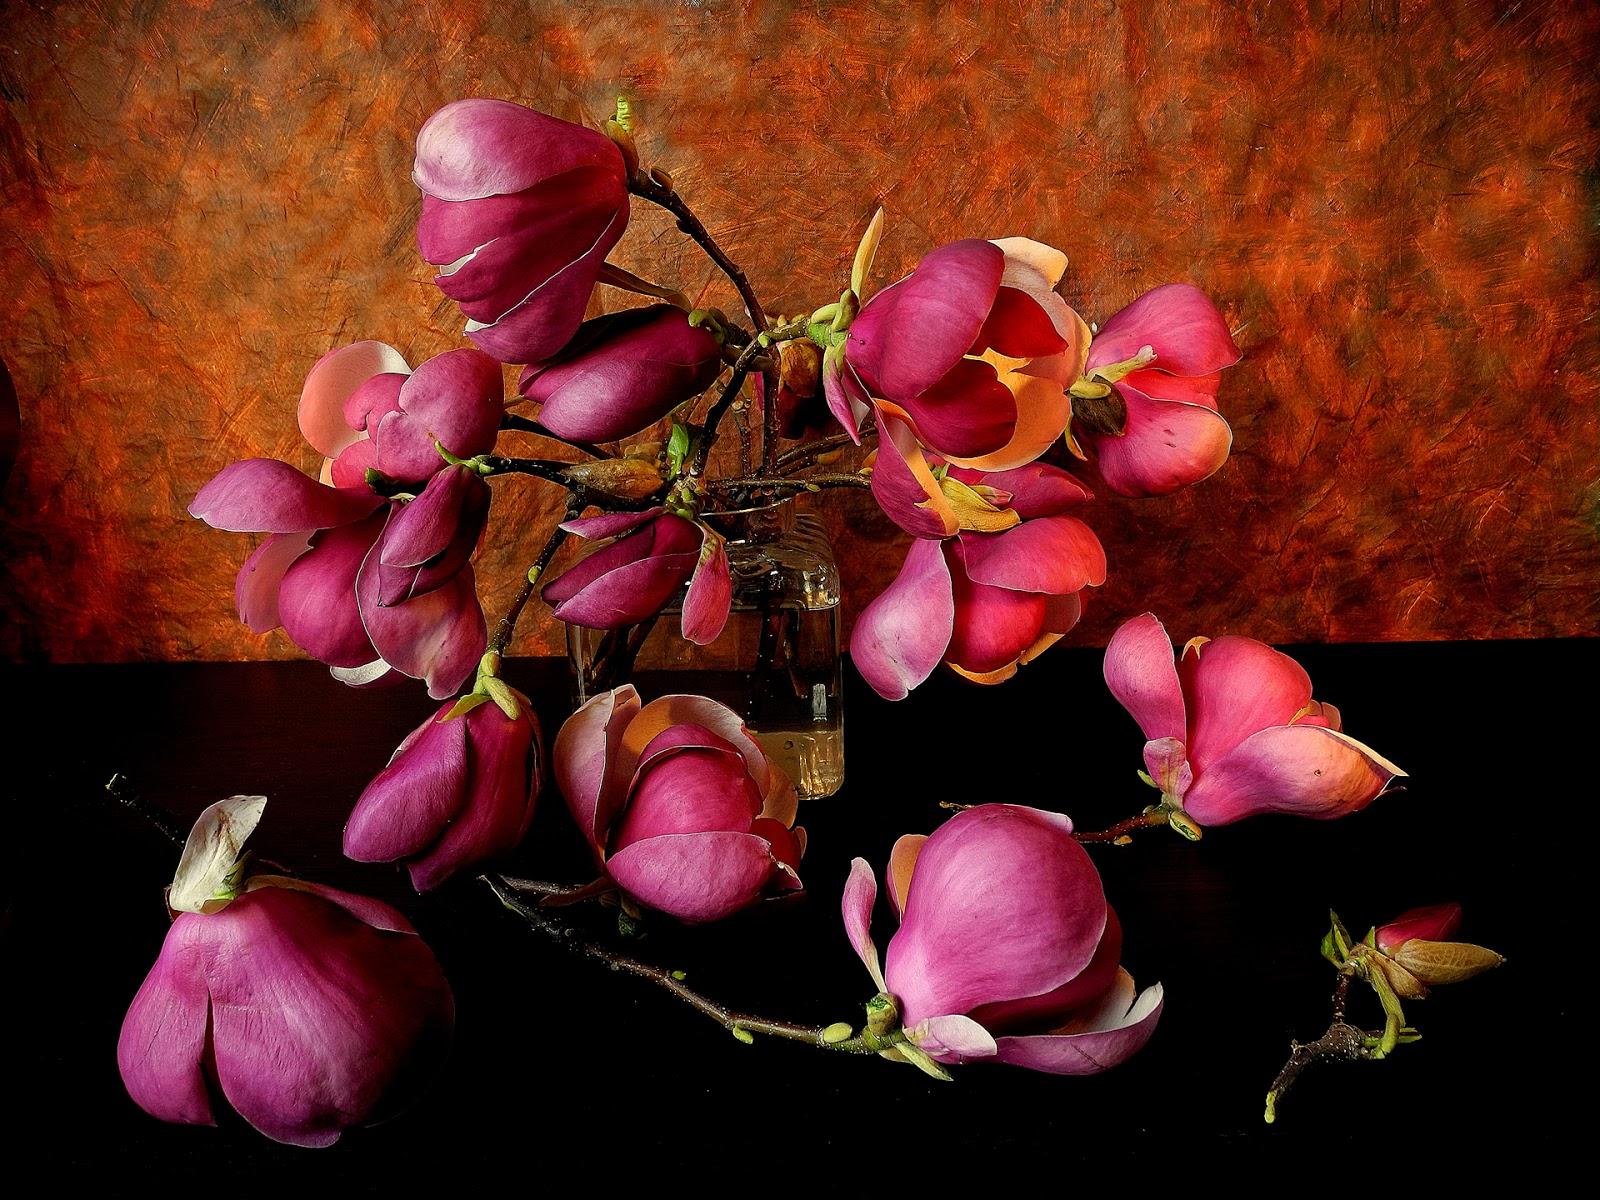 Ver Fotos De Arreglos Florales Naturales